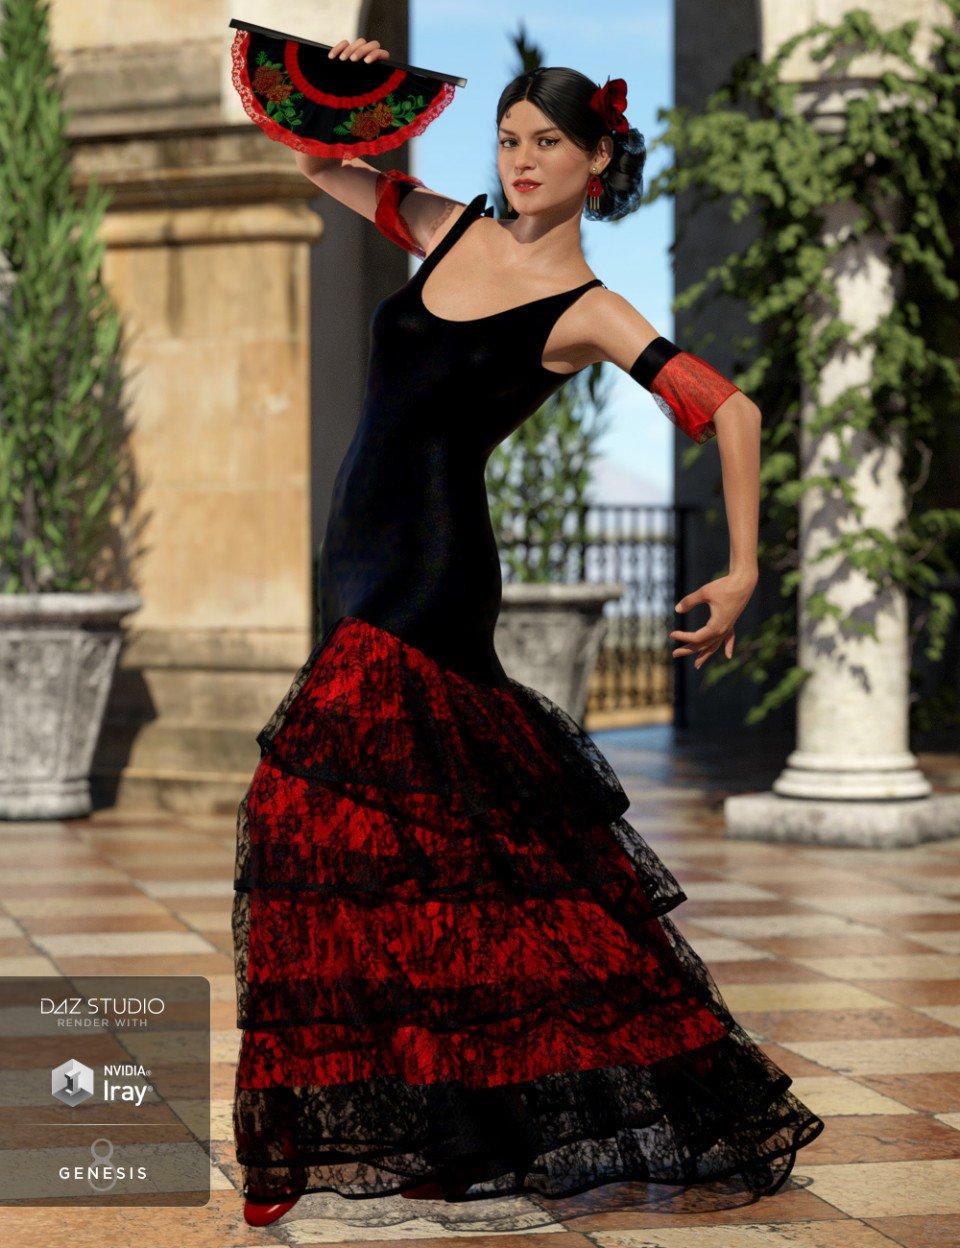 dforce-flamenco-dancer-outfit-for-genesis-8-female(s)